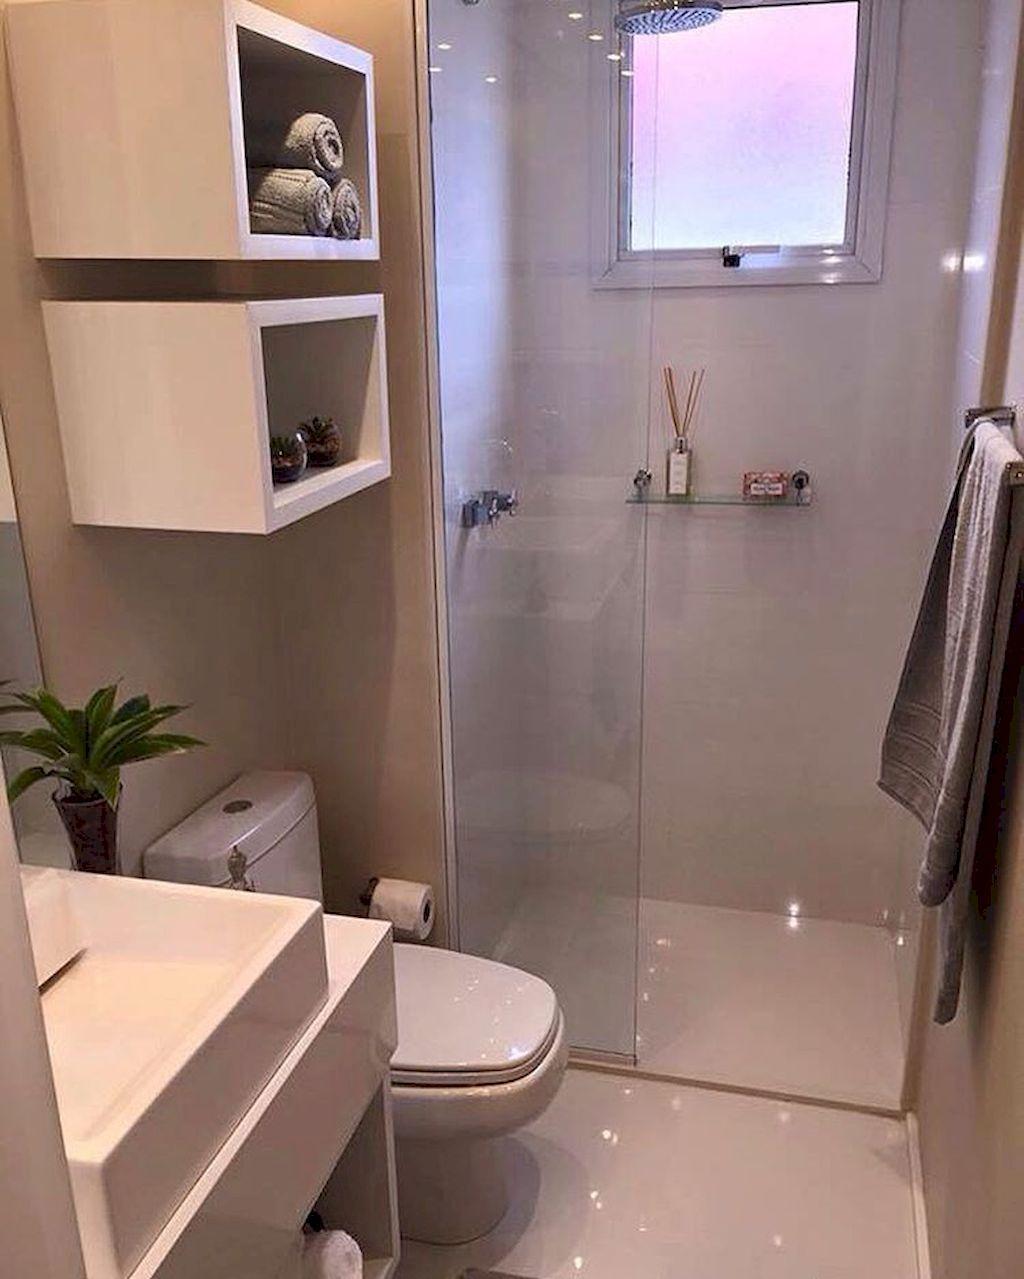 Small Bathroom Design Ideas Apartment Therapy (5) - home ... on Small Apartment Bathroom Storage Ideas  id=17505